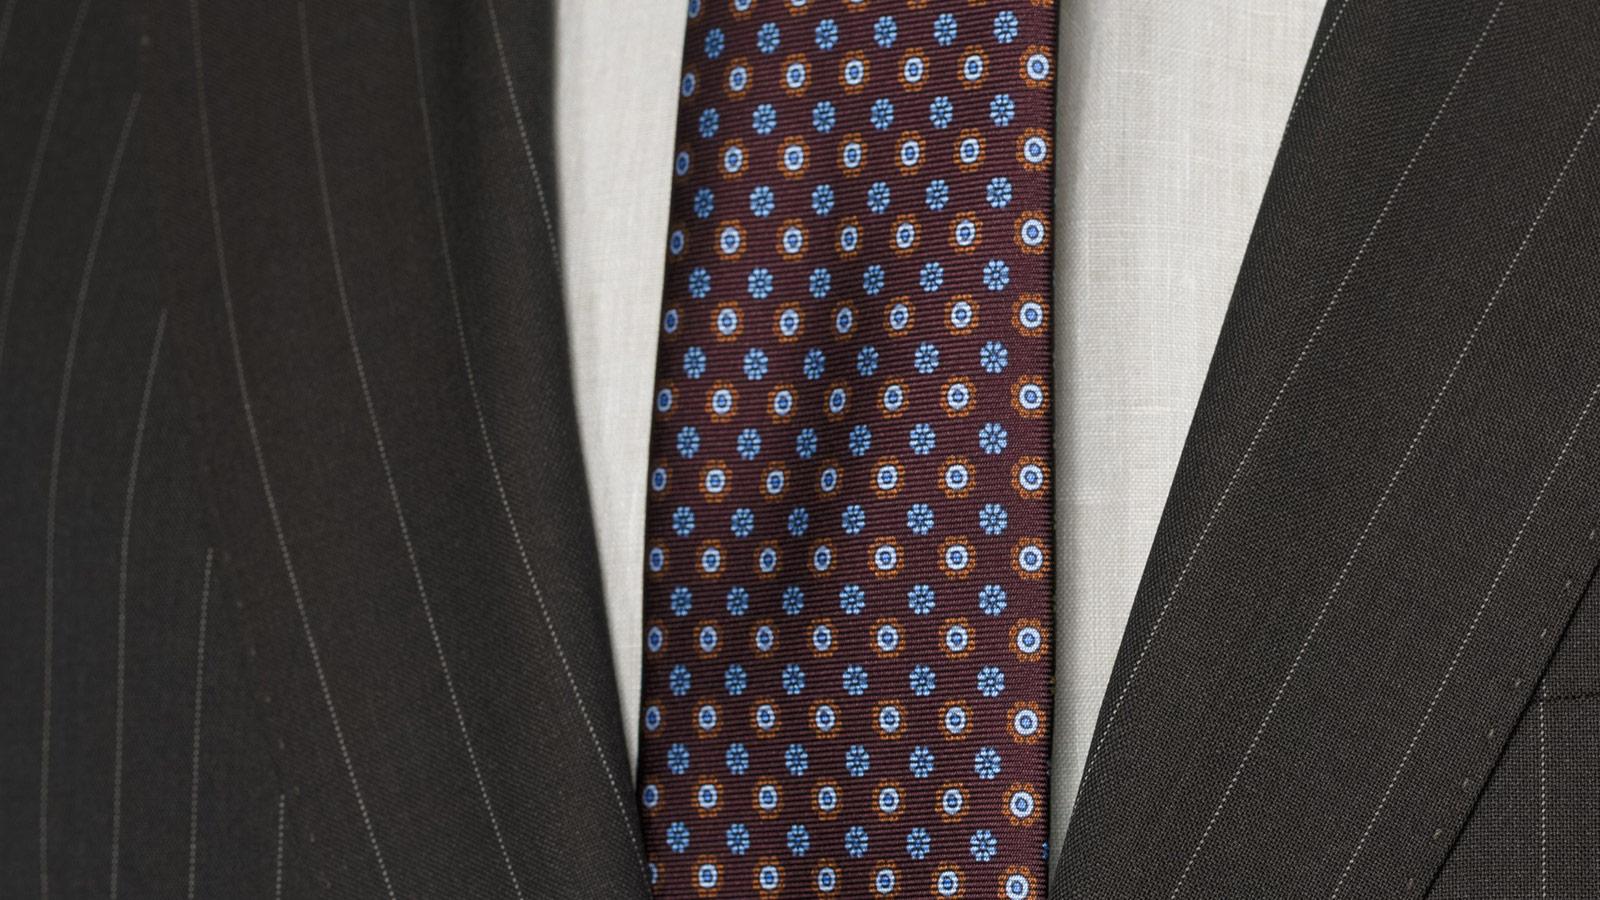 Vendetta Premium Brown Pinstripe Suit - slider image 1